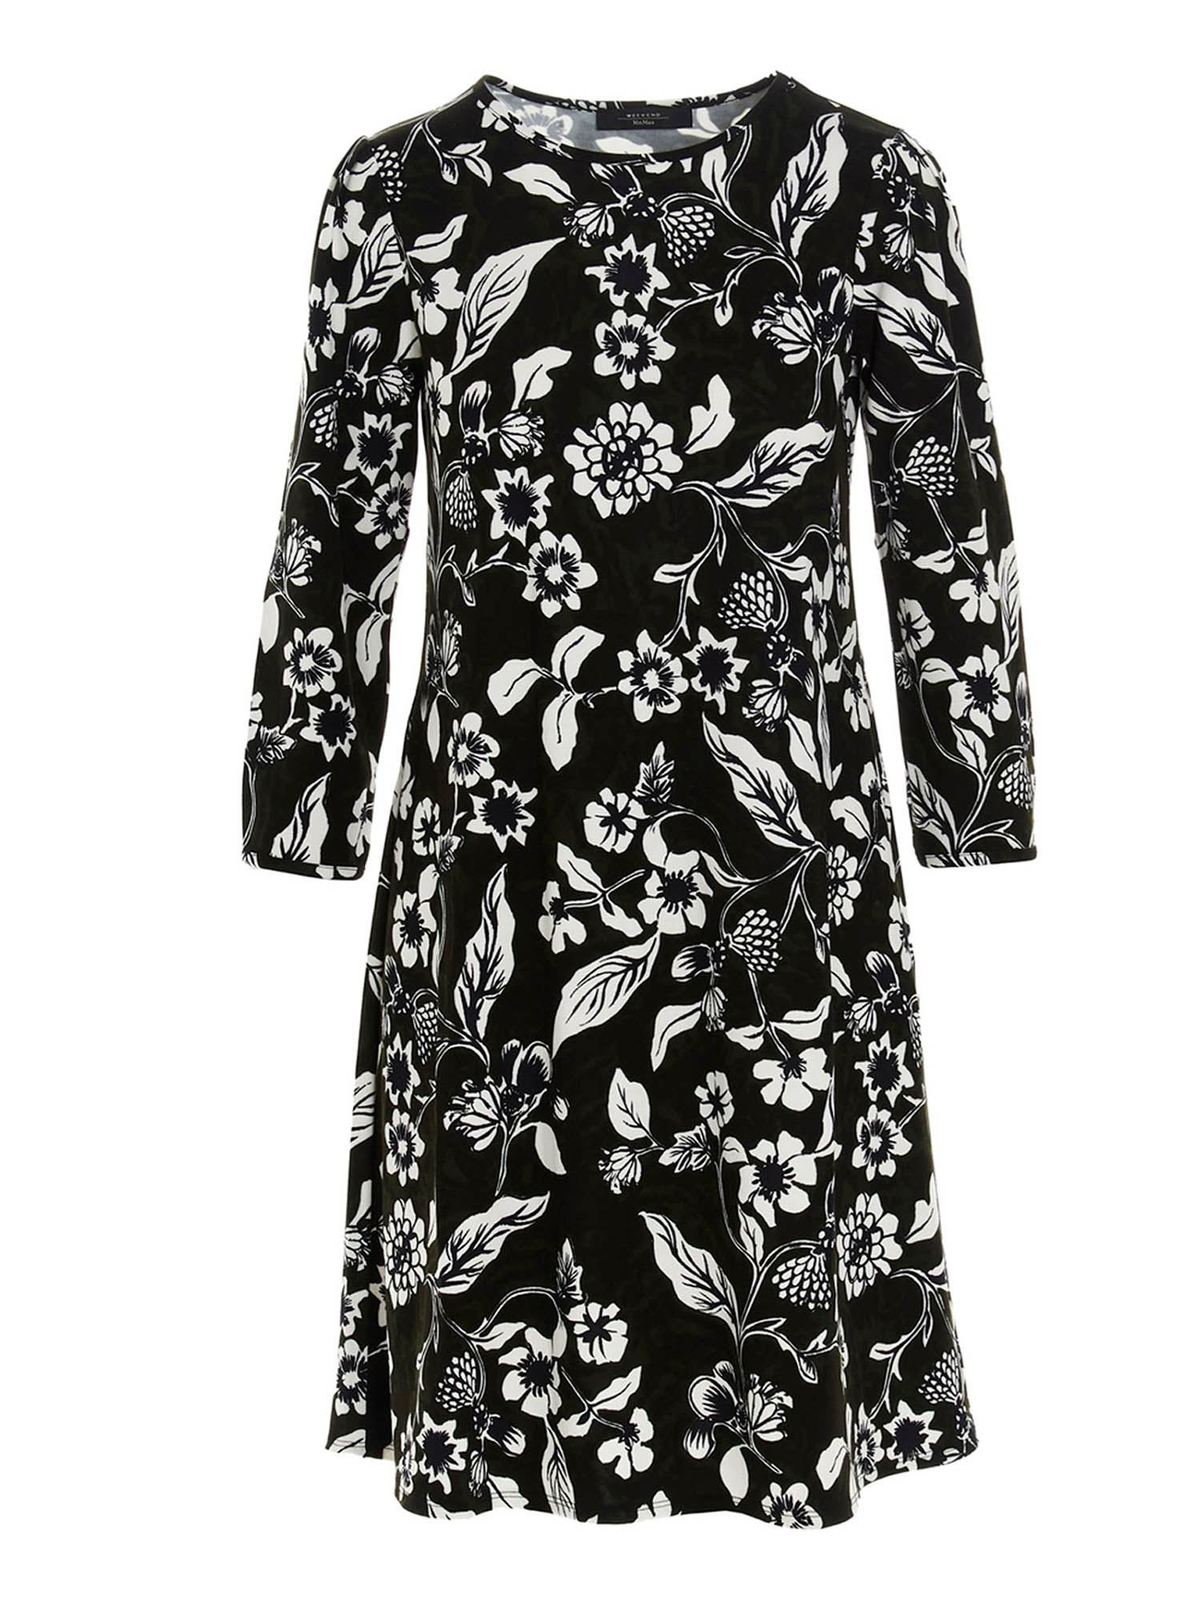 Weekend Max Mara Cottons NOVELI FLORAL DRESS IN BLACK